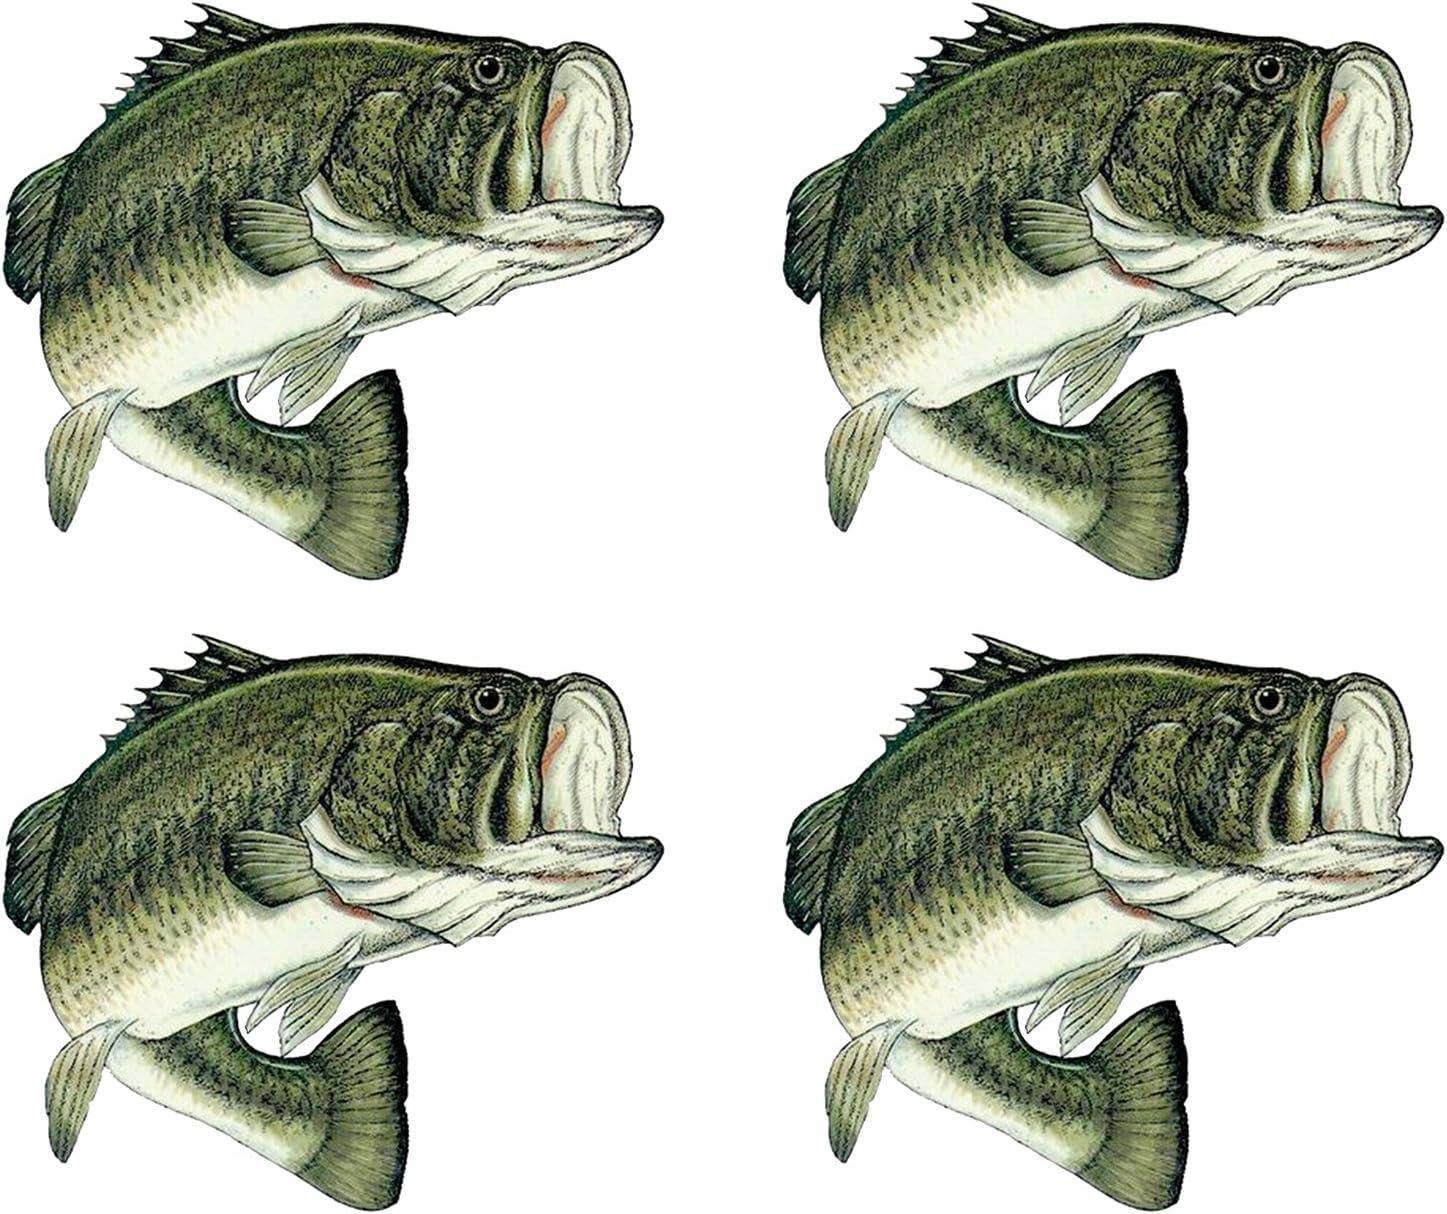 FISHING LURE Vinyl Decal Sticker Car Window Wall Bumper Boat Bass Gone Fish Reel